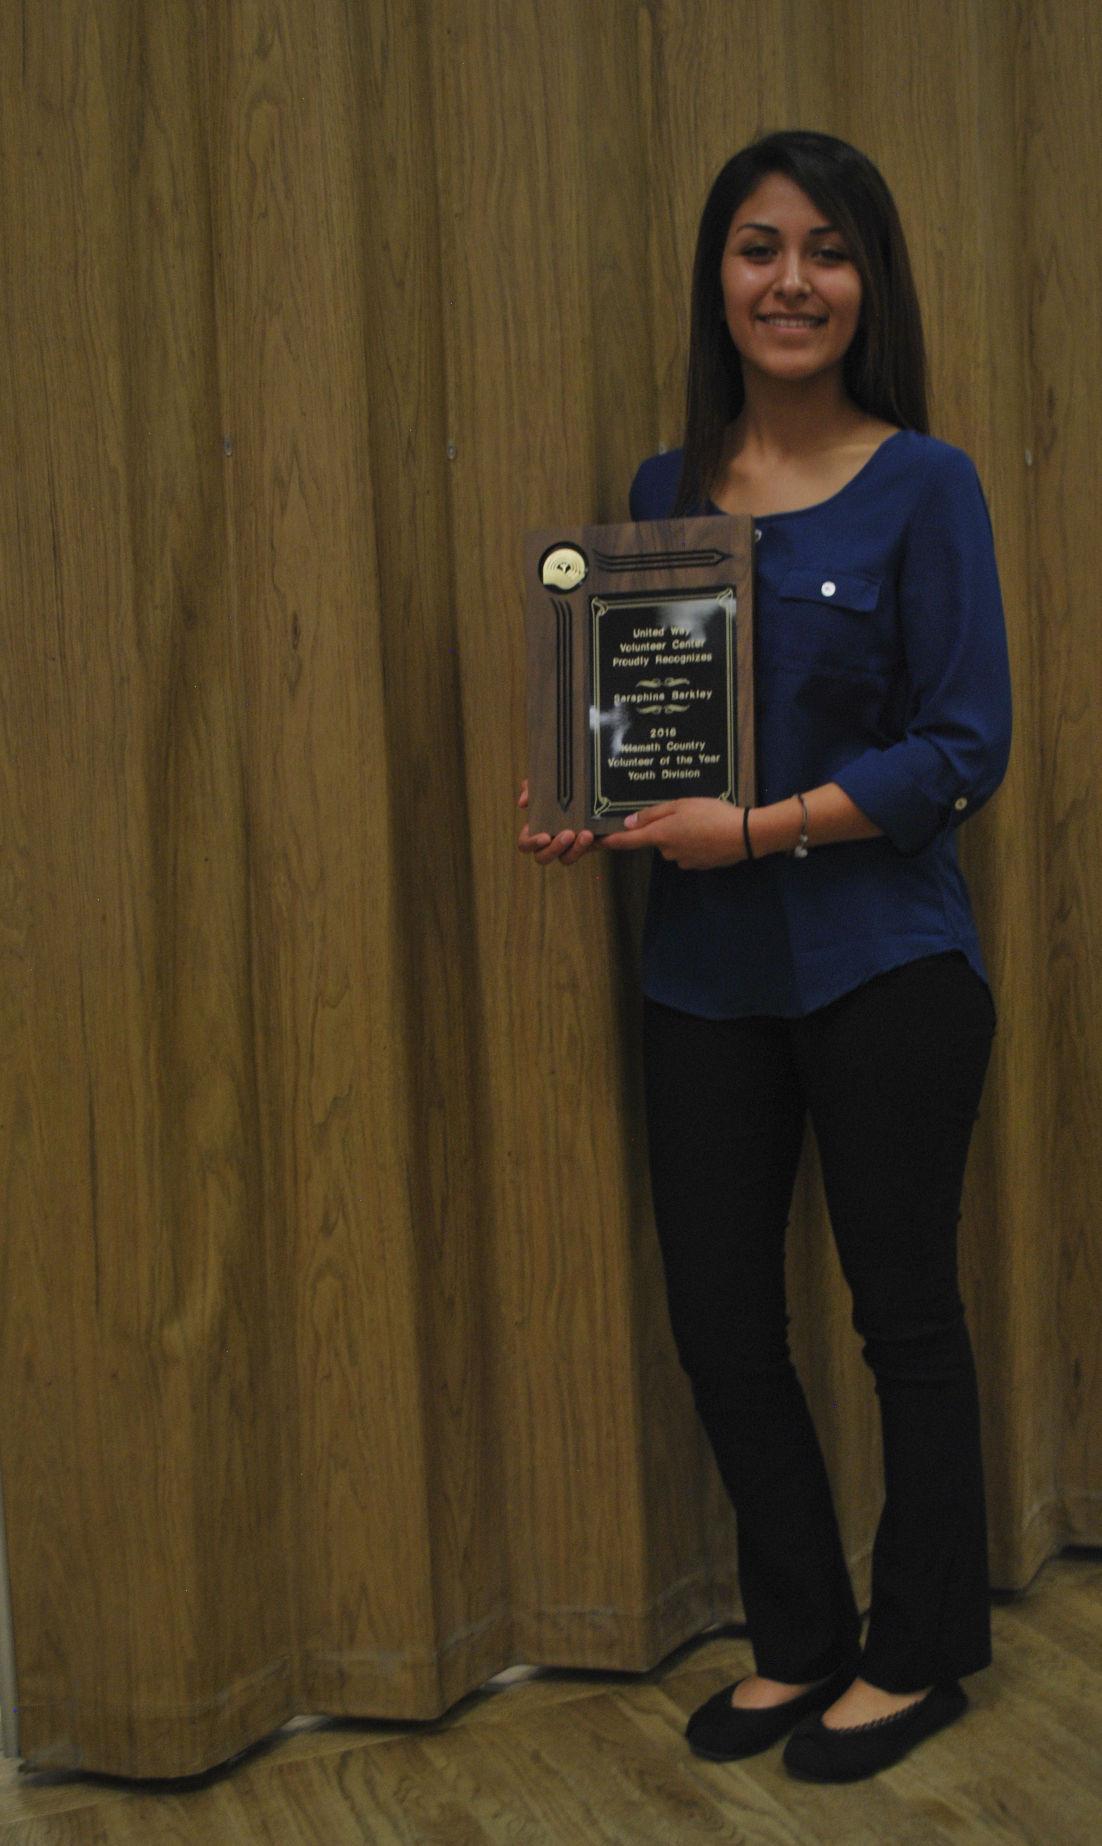 Volunteer of the Year awards